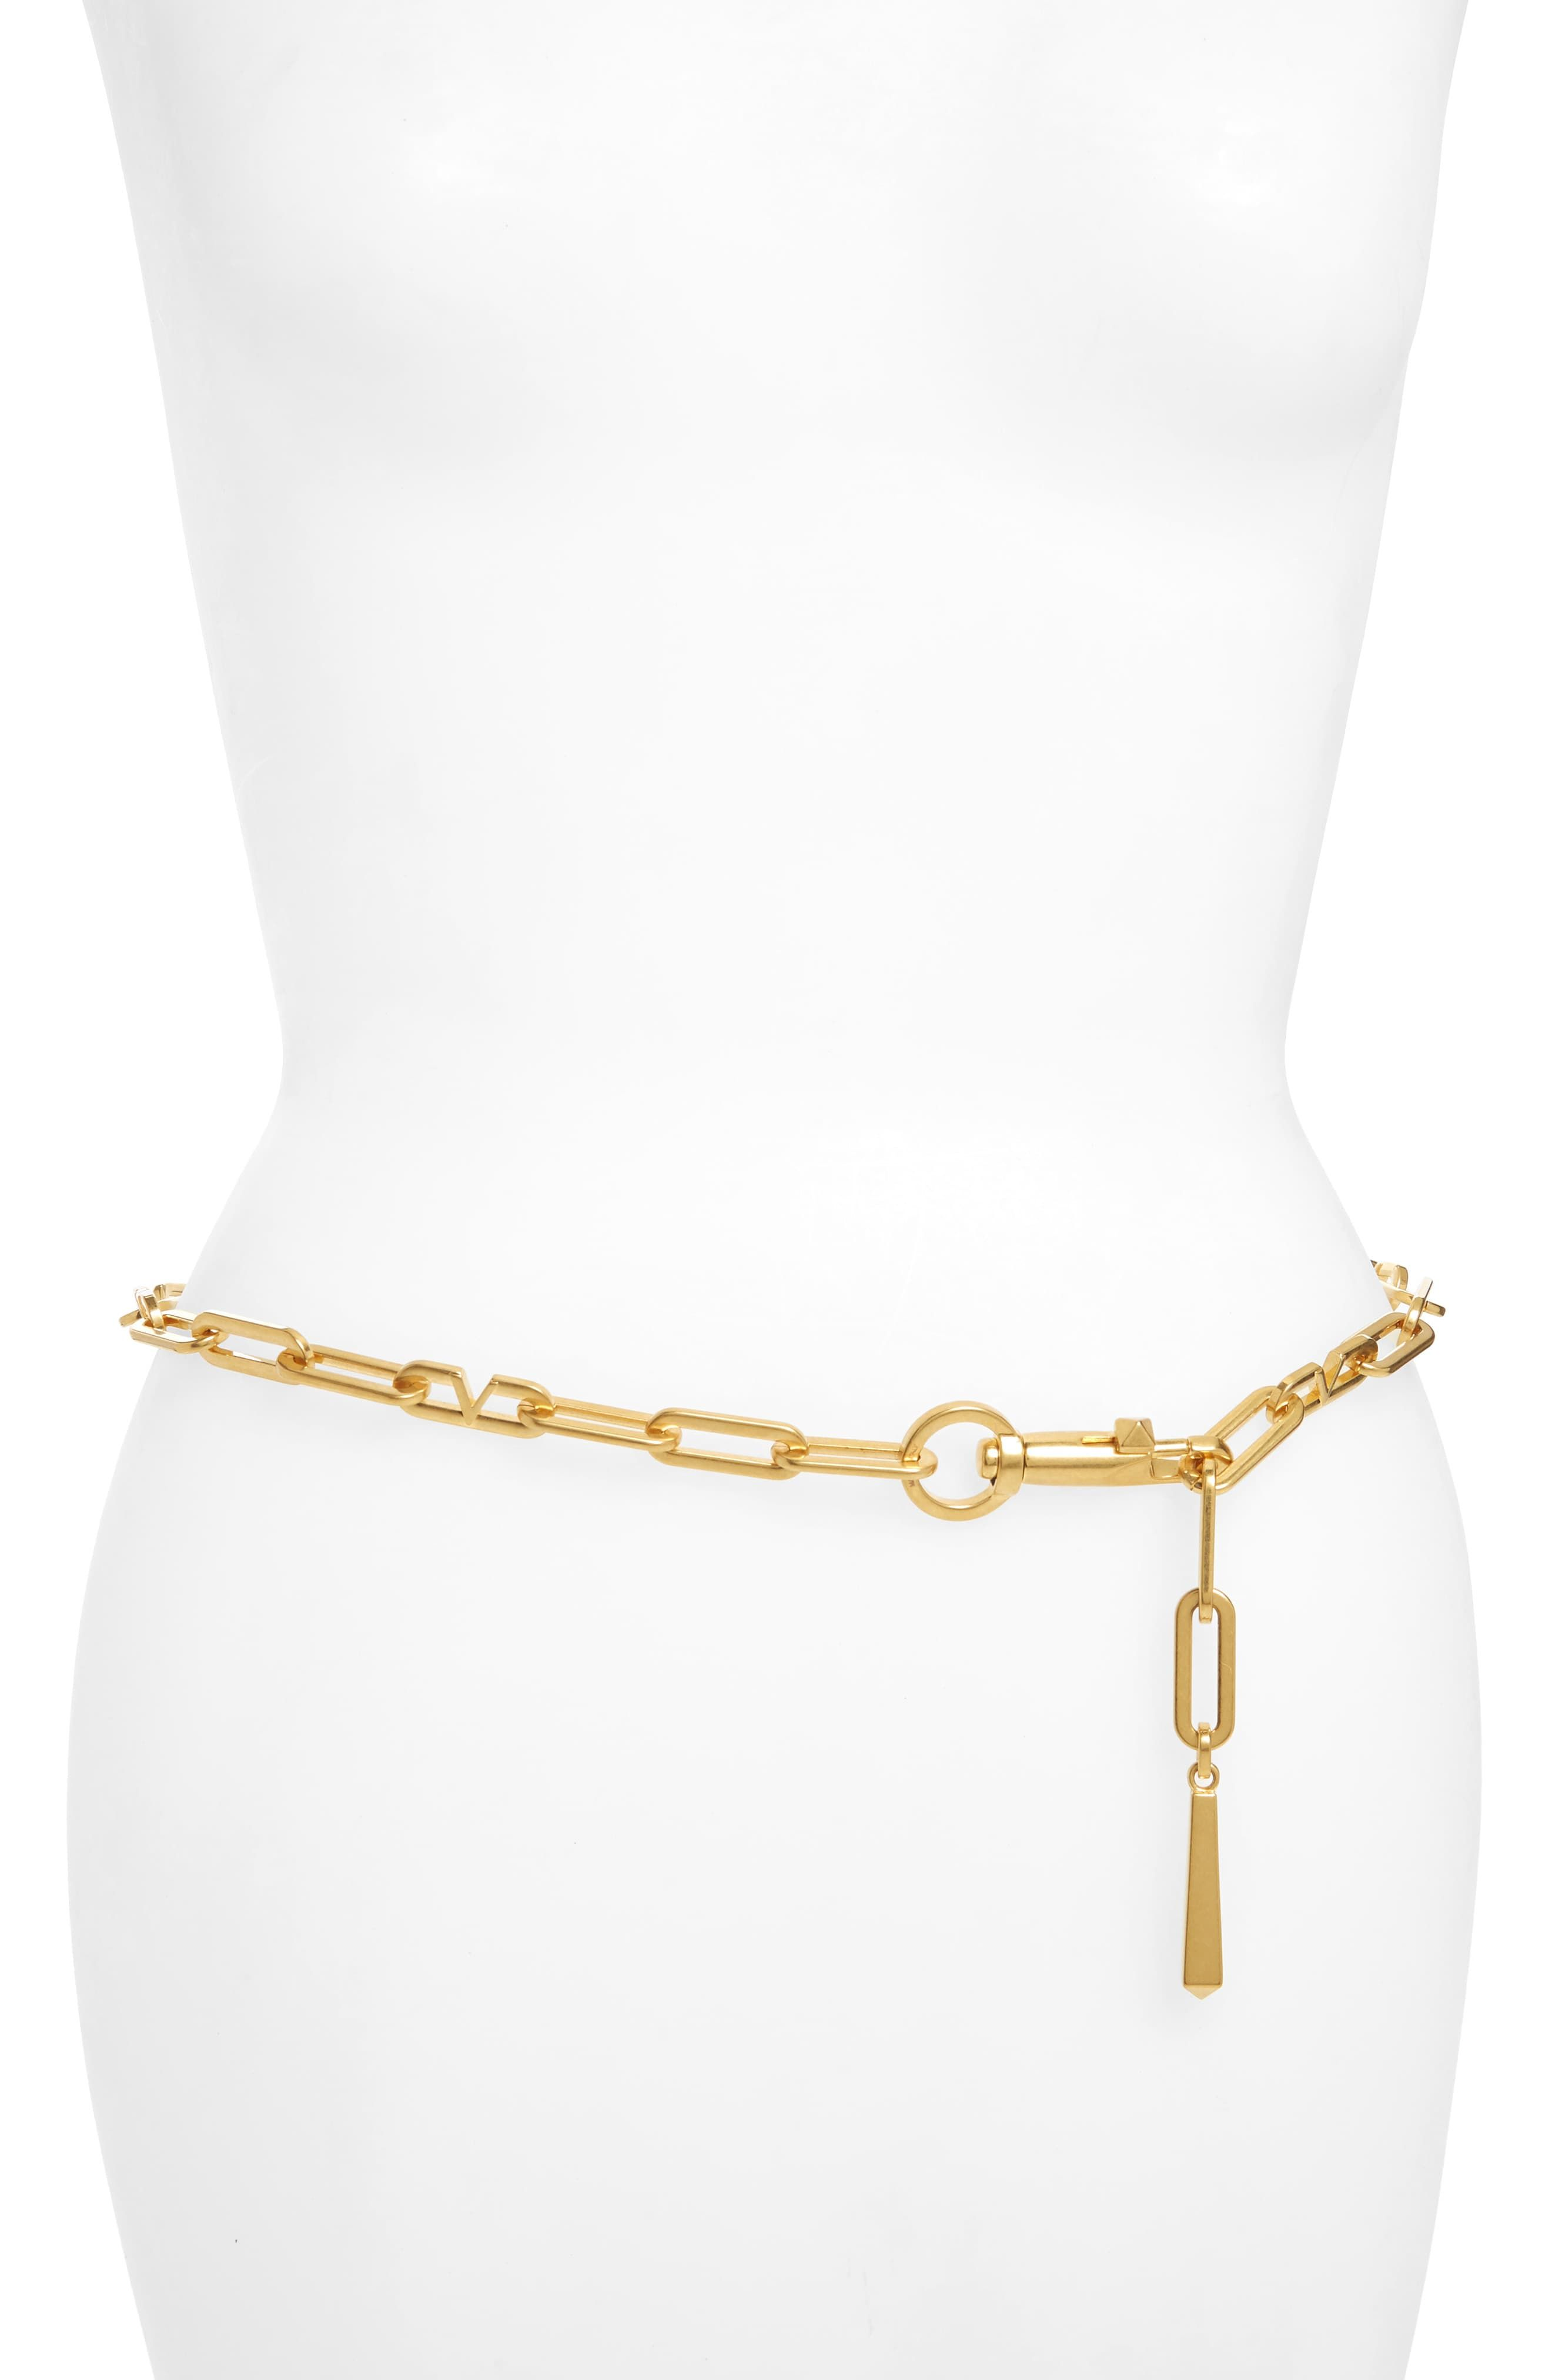 New Women Gold Metal Chain Links Fashion Belt Hip High Waist Fringes Size S M